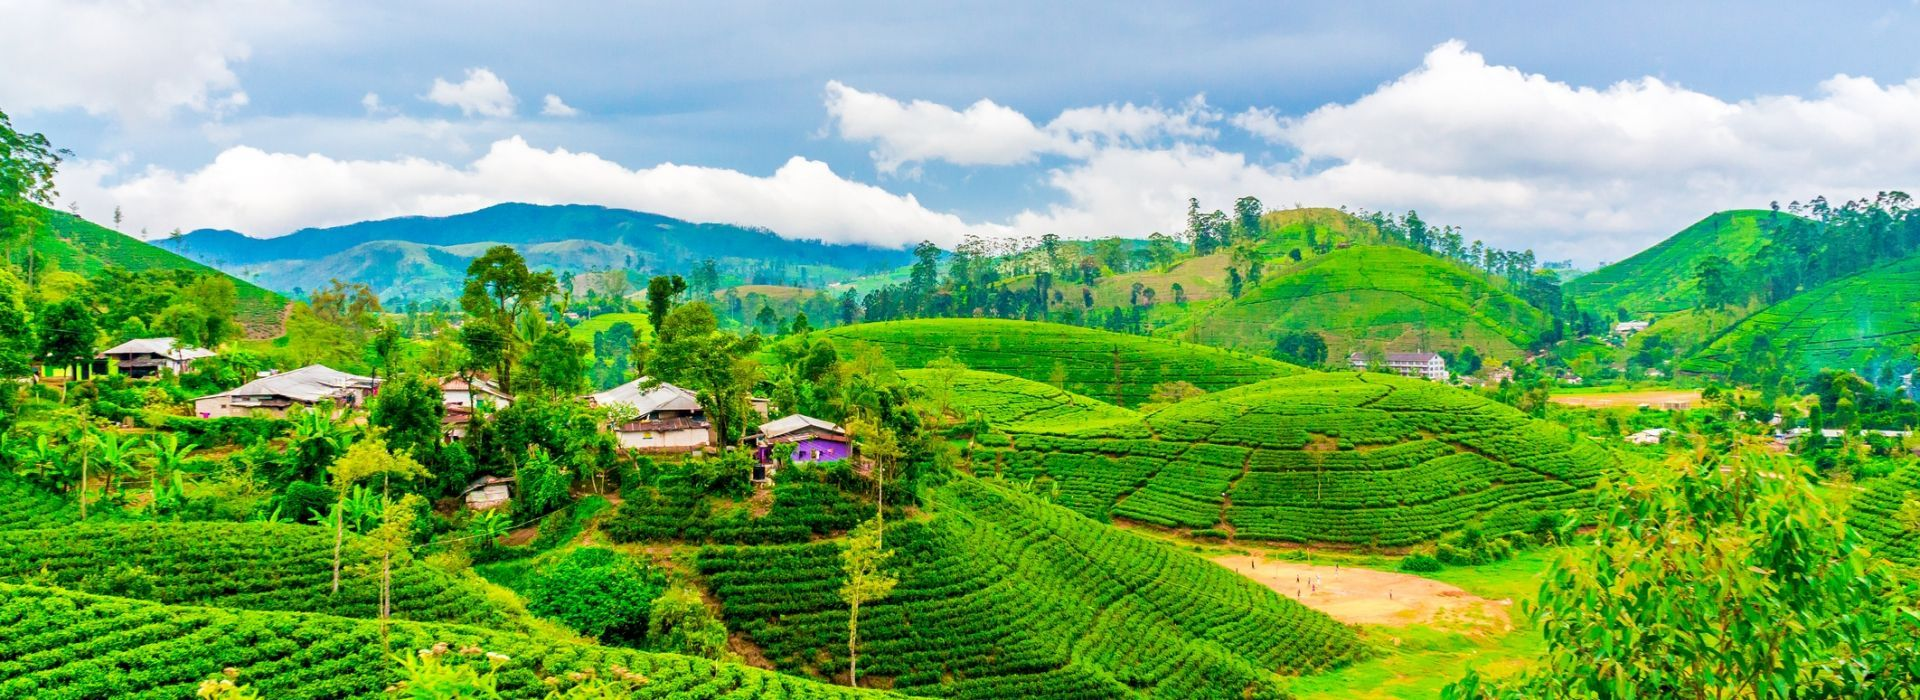 National parks Tours in Sri Lanka